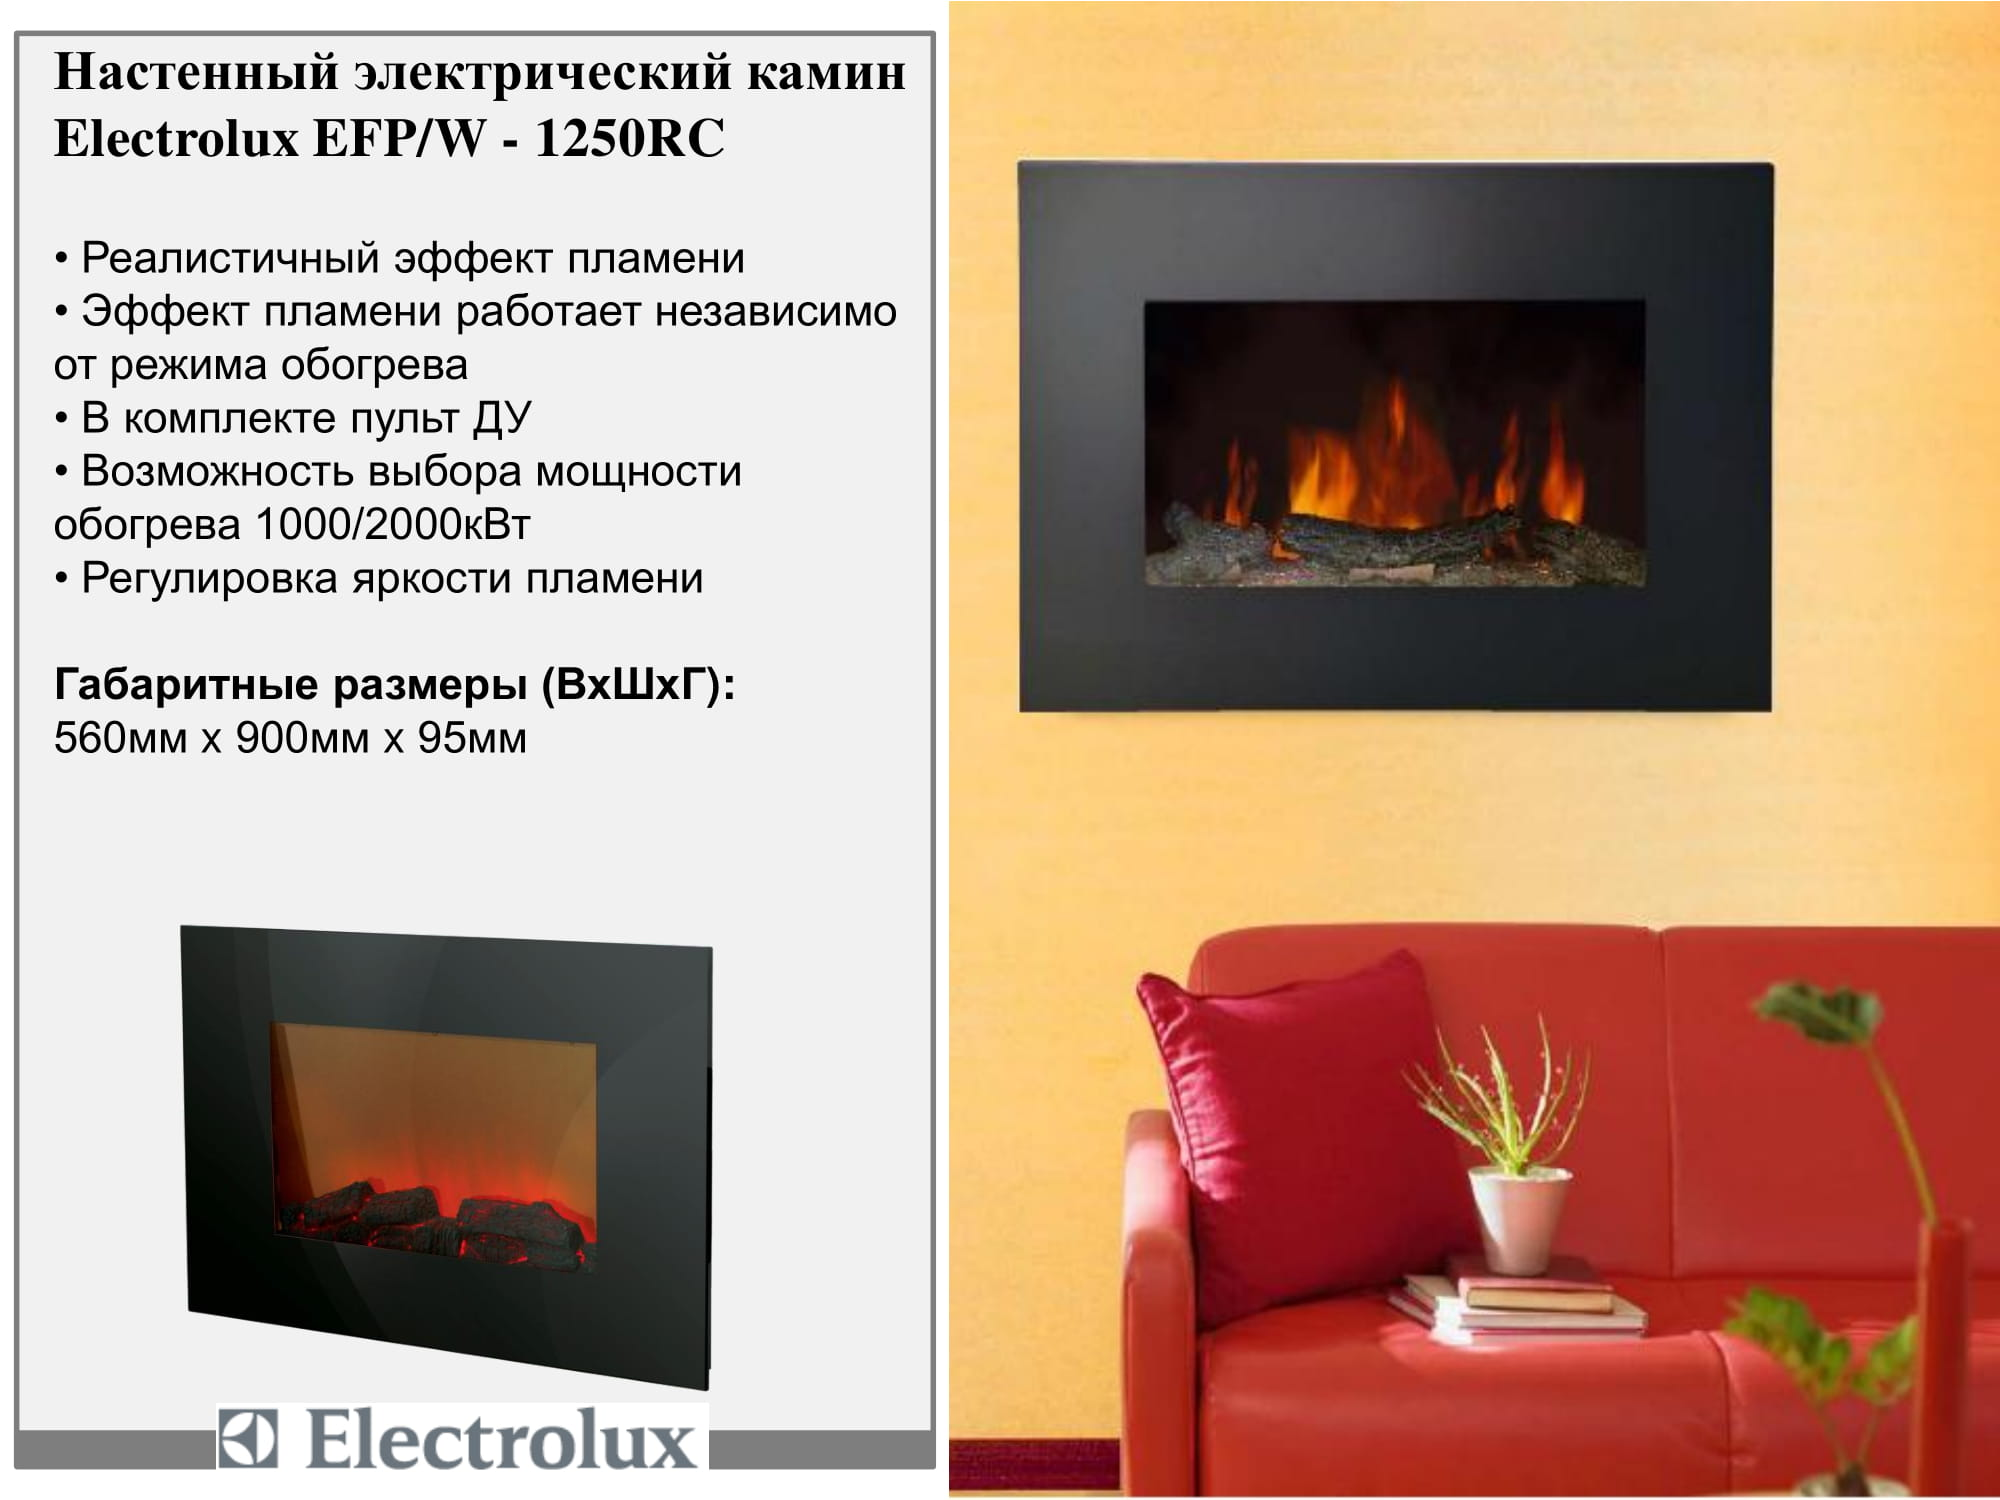 Electrolux EFP/W-1250RC